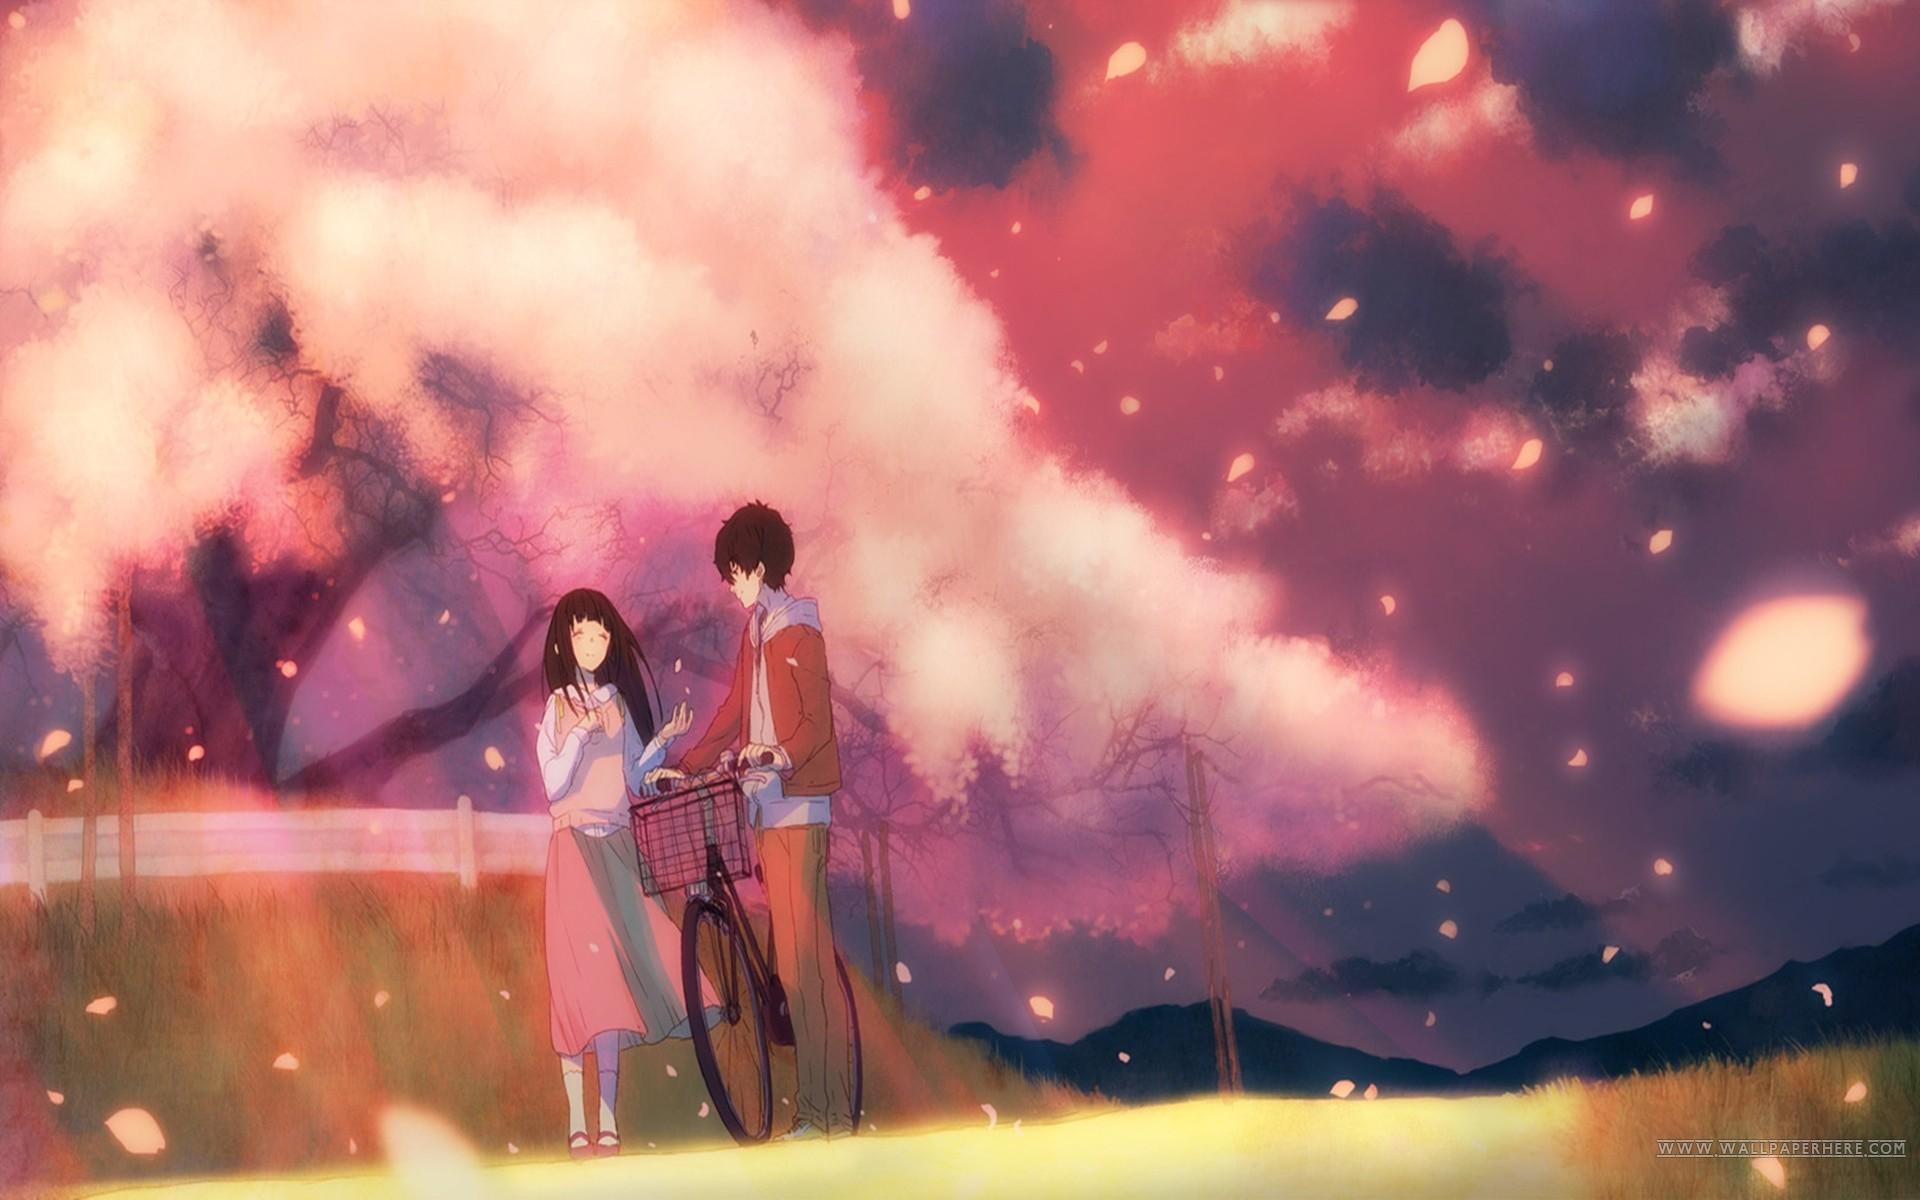 Anime anime Hyouka cherry blossom Chitanda Eru Oreki Houtarou